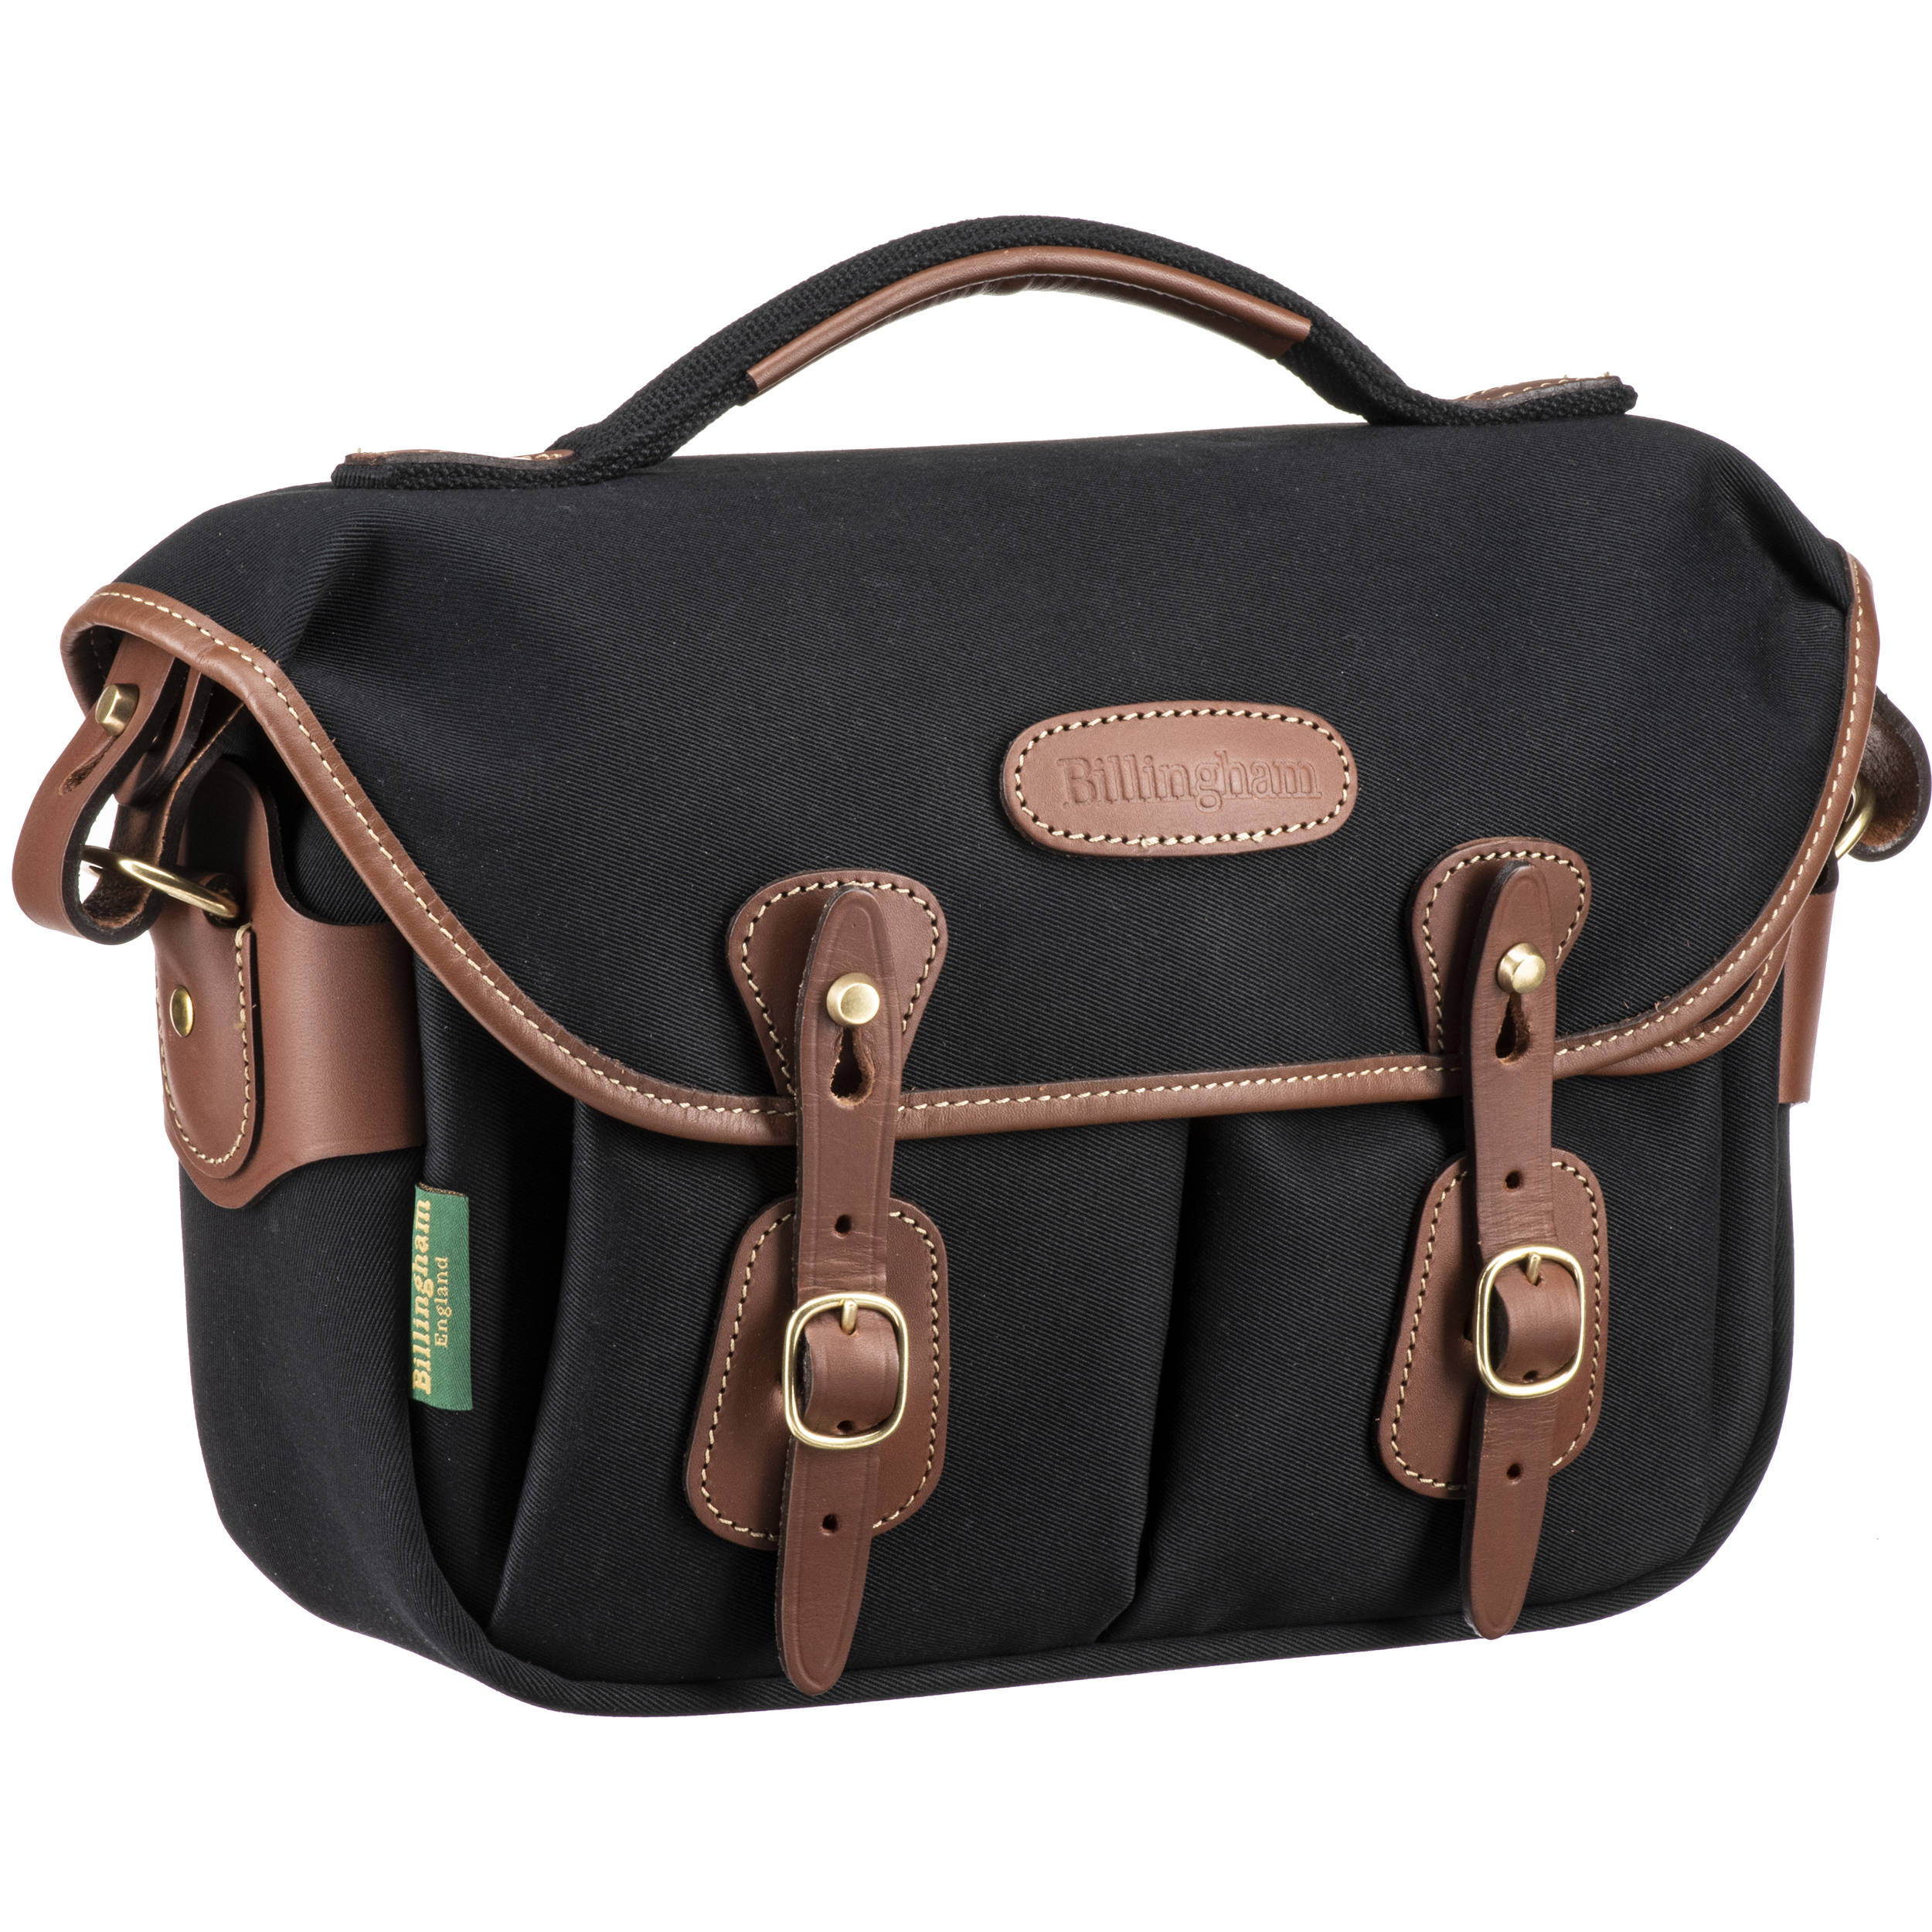 Billingham Hadley Small Pro Shoulder Bag Black Canvas Tan Leather